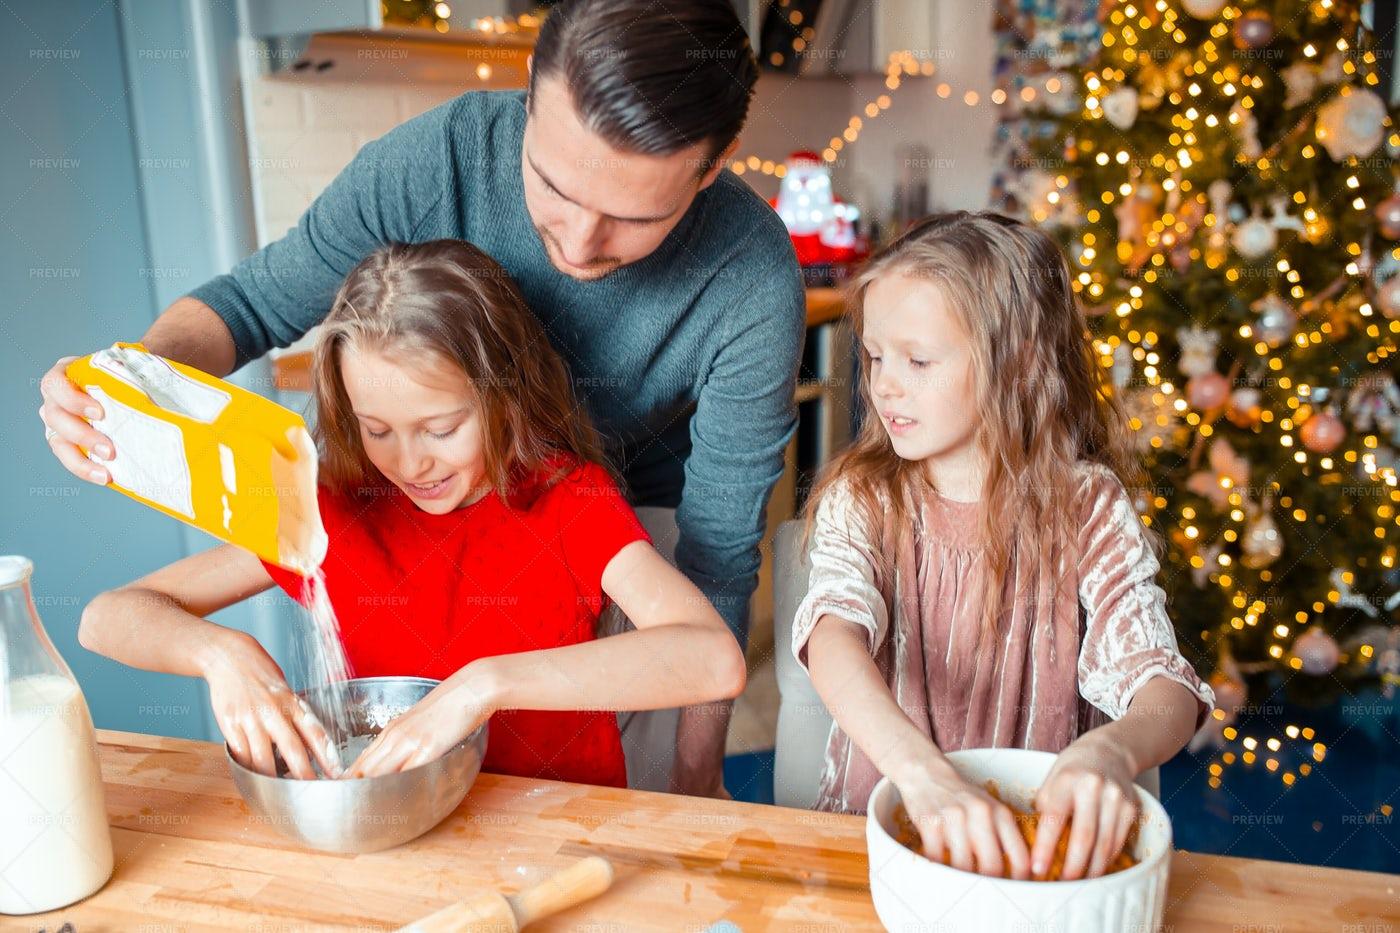 Baking Cookies On Christmas: Stock Photos